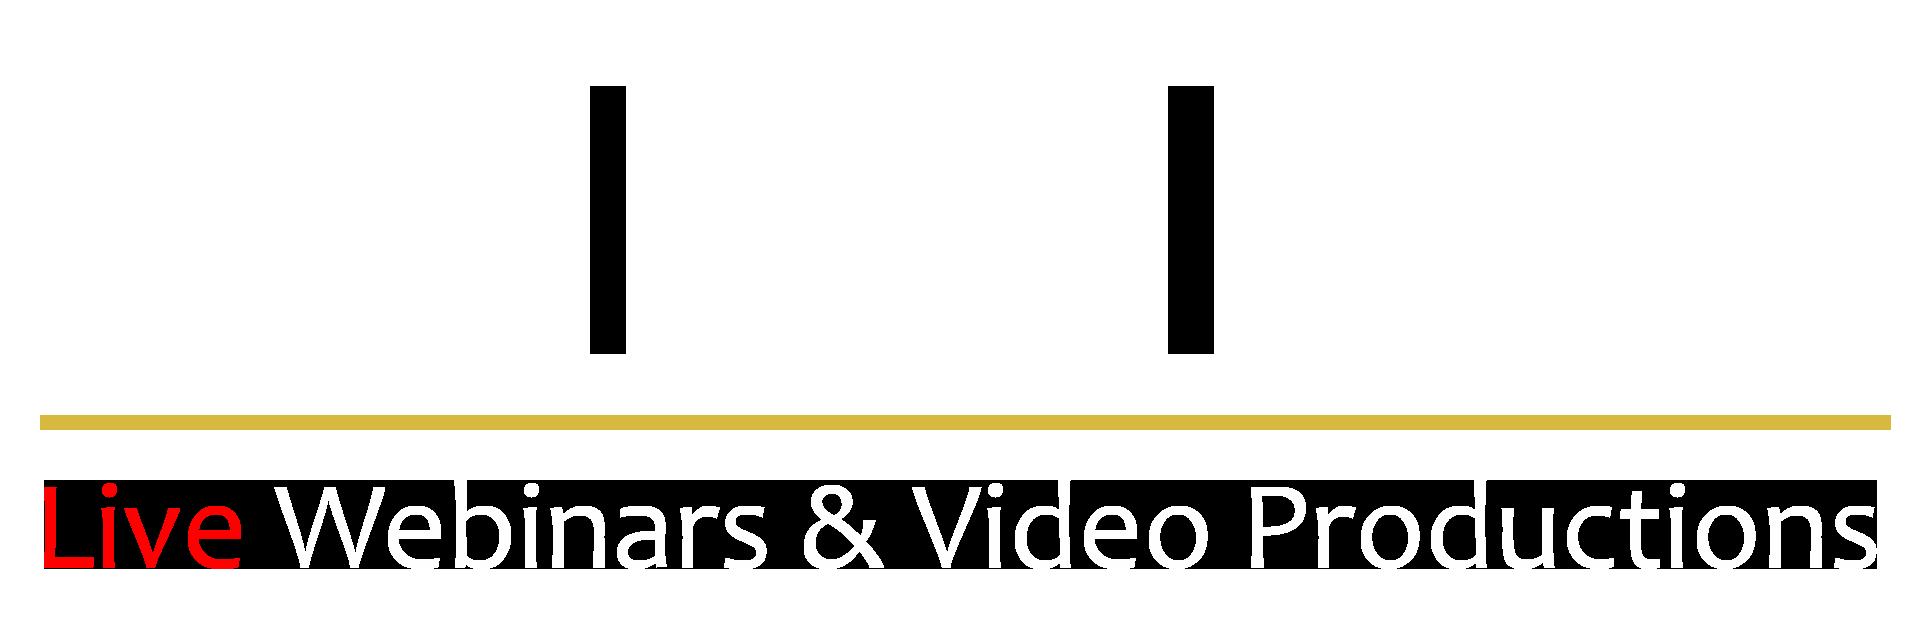 ATW PRODUCTIONS - ΠΑΡΑΓΩΓΕΣ LIVE WEBINAR - ΠΑΡΑΓΩΓΕΣ BINTEO CONTENT - ΕΤΑΙΡΙΚΕΣ ΠΑΡΟΥΣΙΑΣΕΙΣ - ΠΑΡΟΥΣΙΑΣΕΙΣ ΠΡΟΪΟΝΤΩΝ